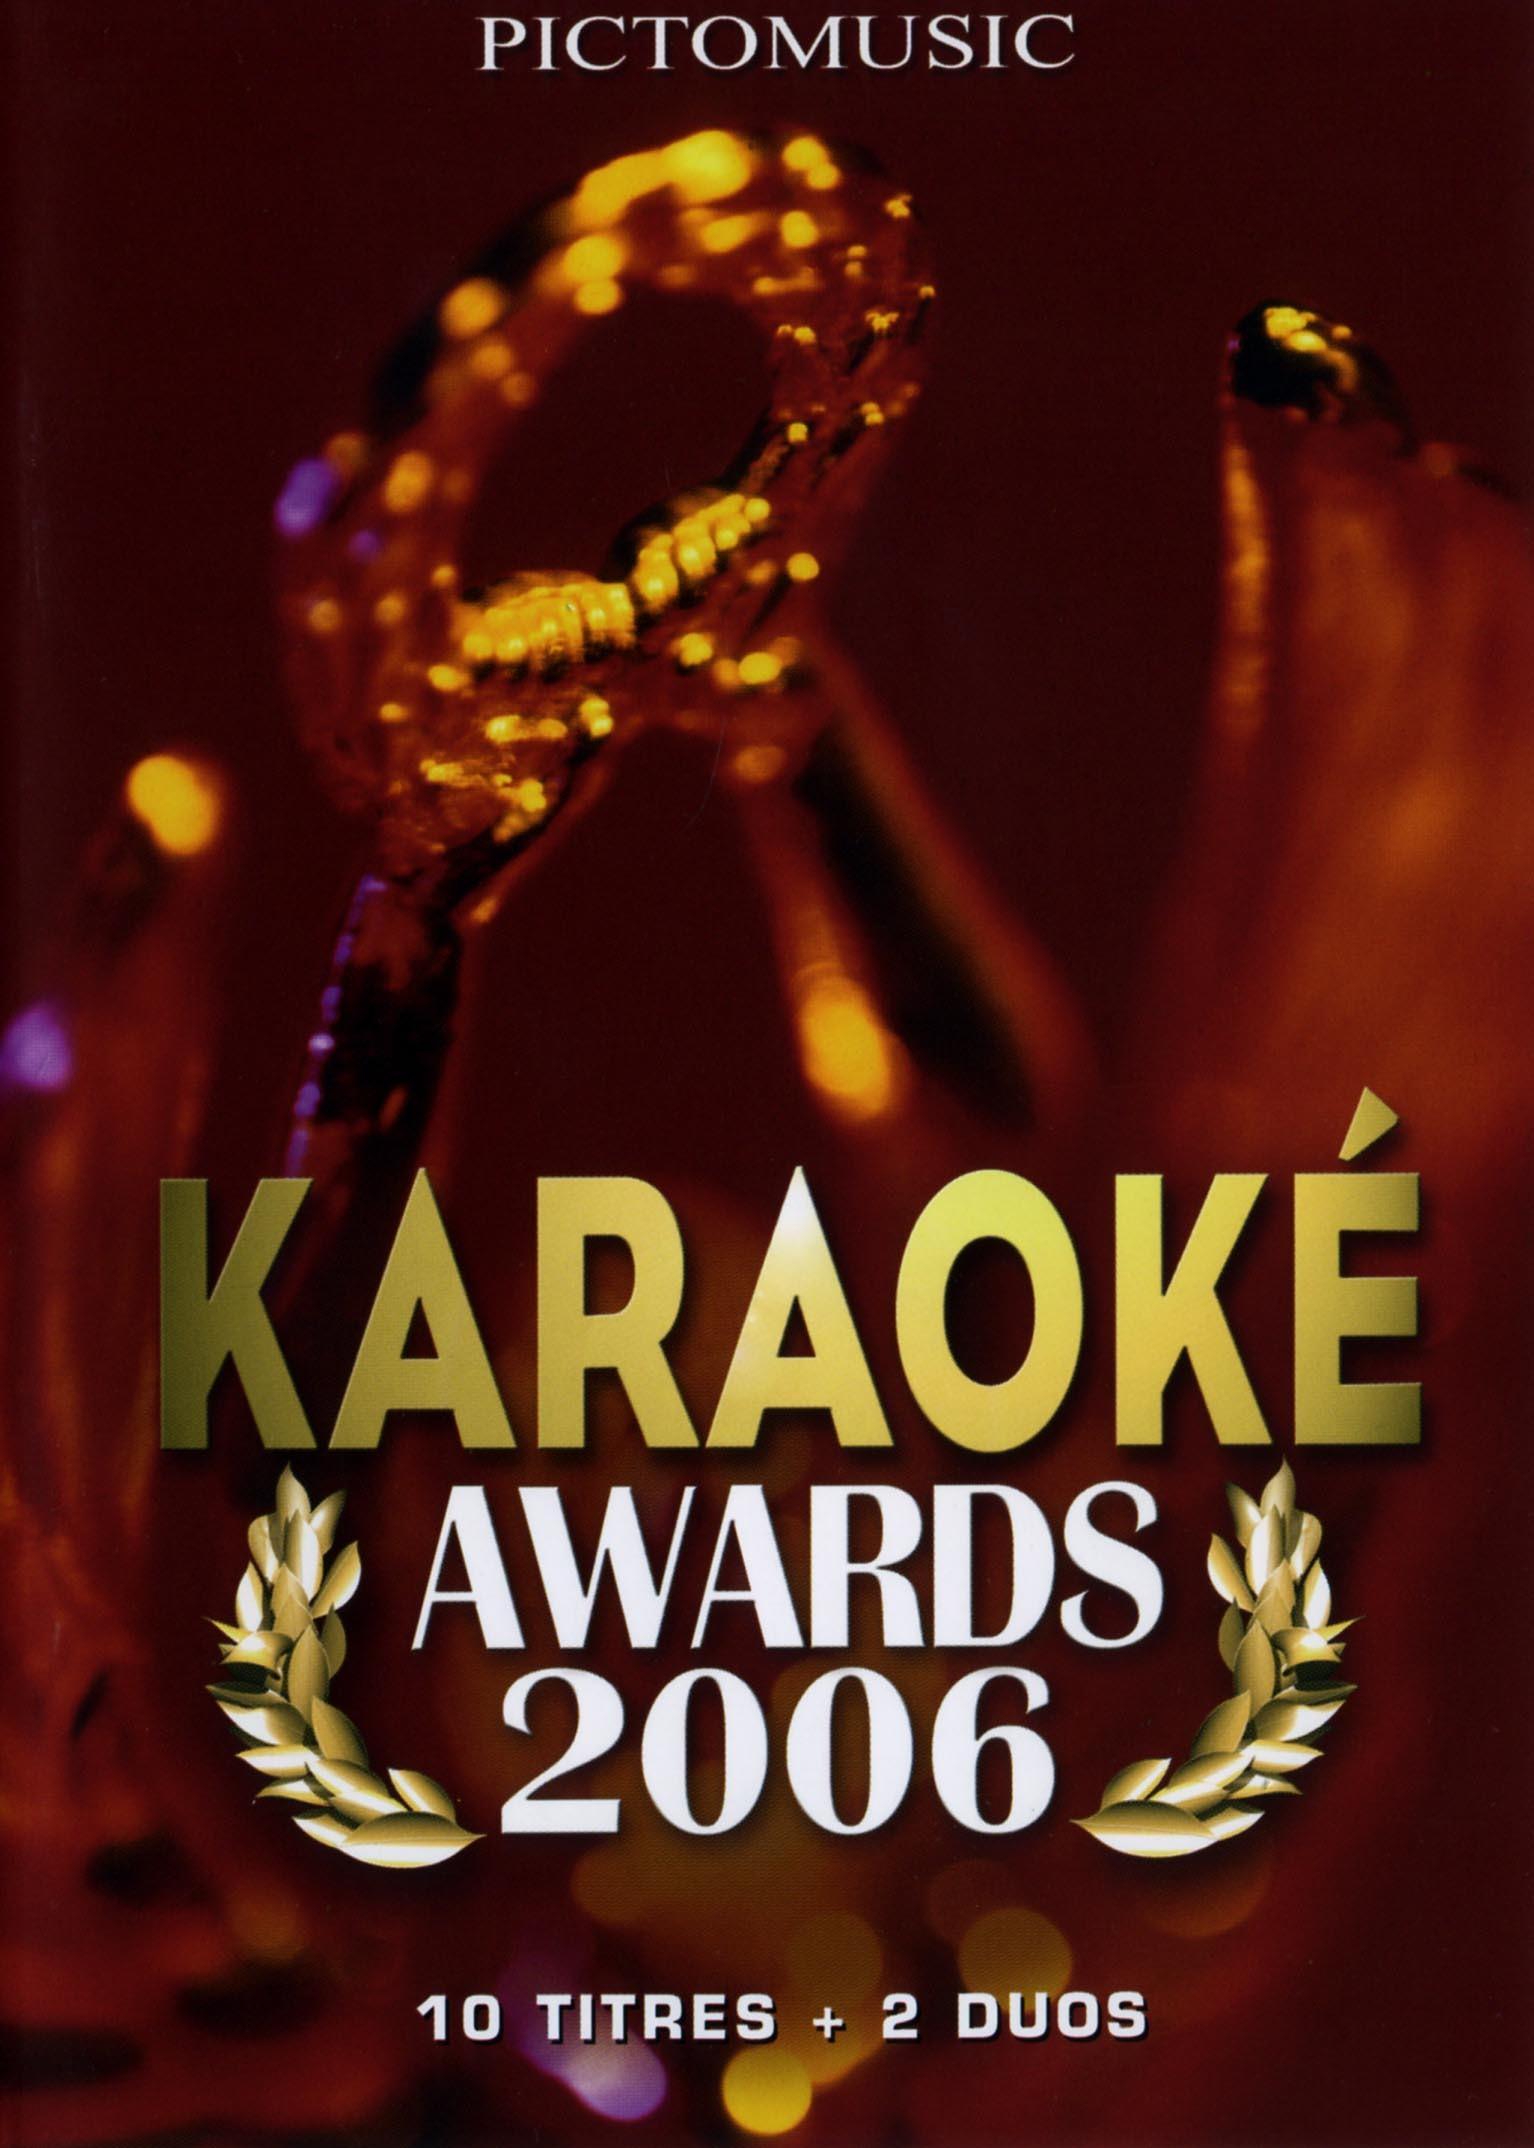 KARAOKE AWARDS 2006